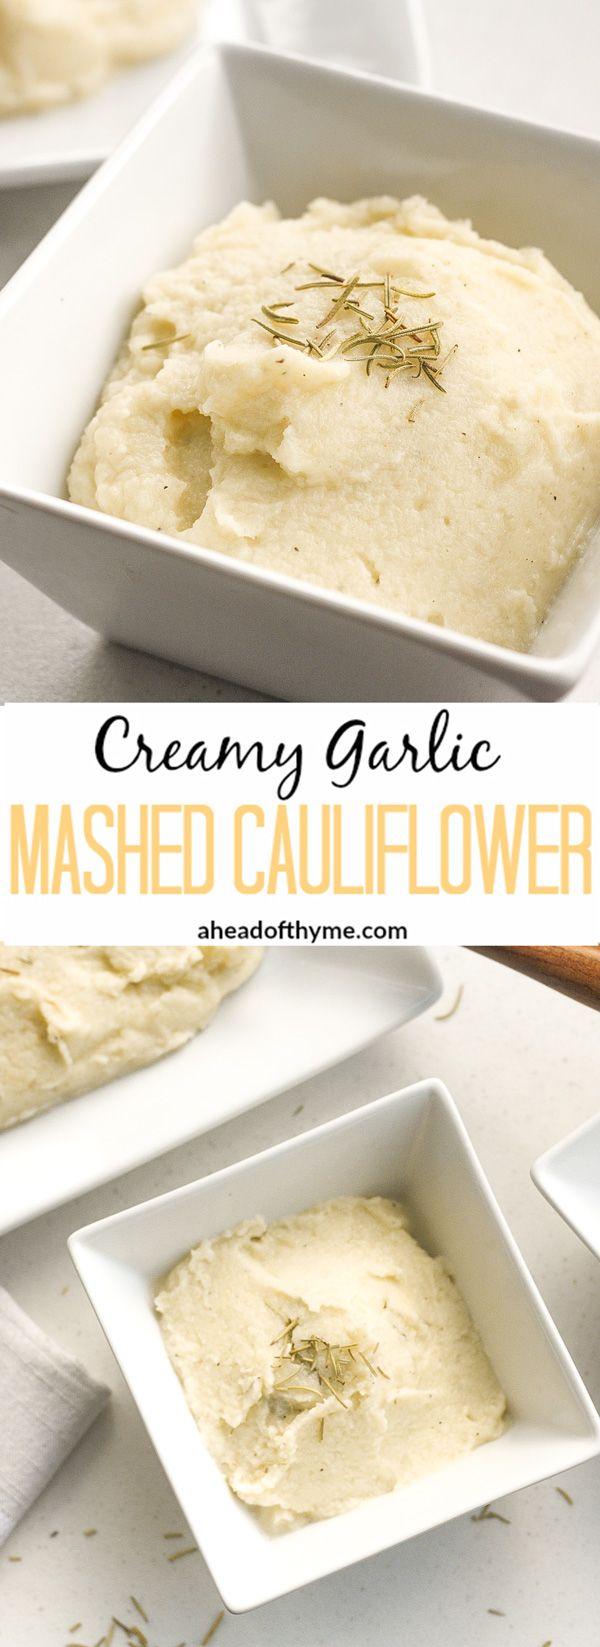 Creamy Garlic Mashed Cauliflower: Imagine having a nice big serving of mashed…